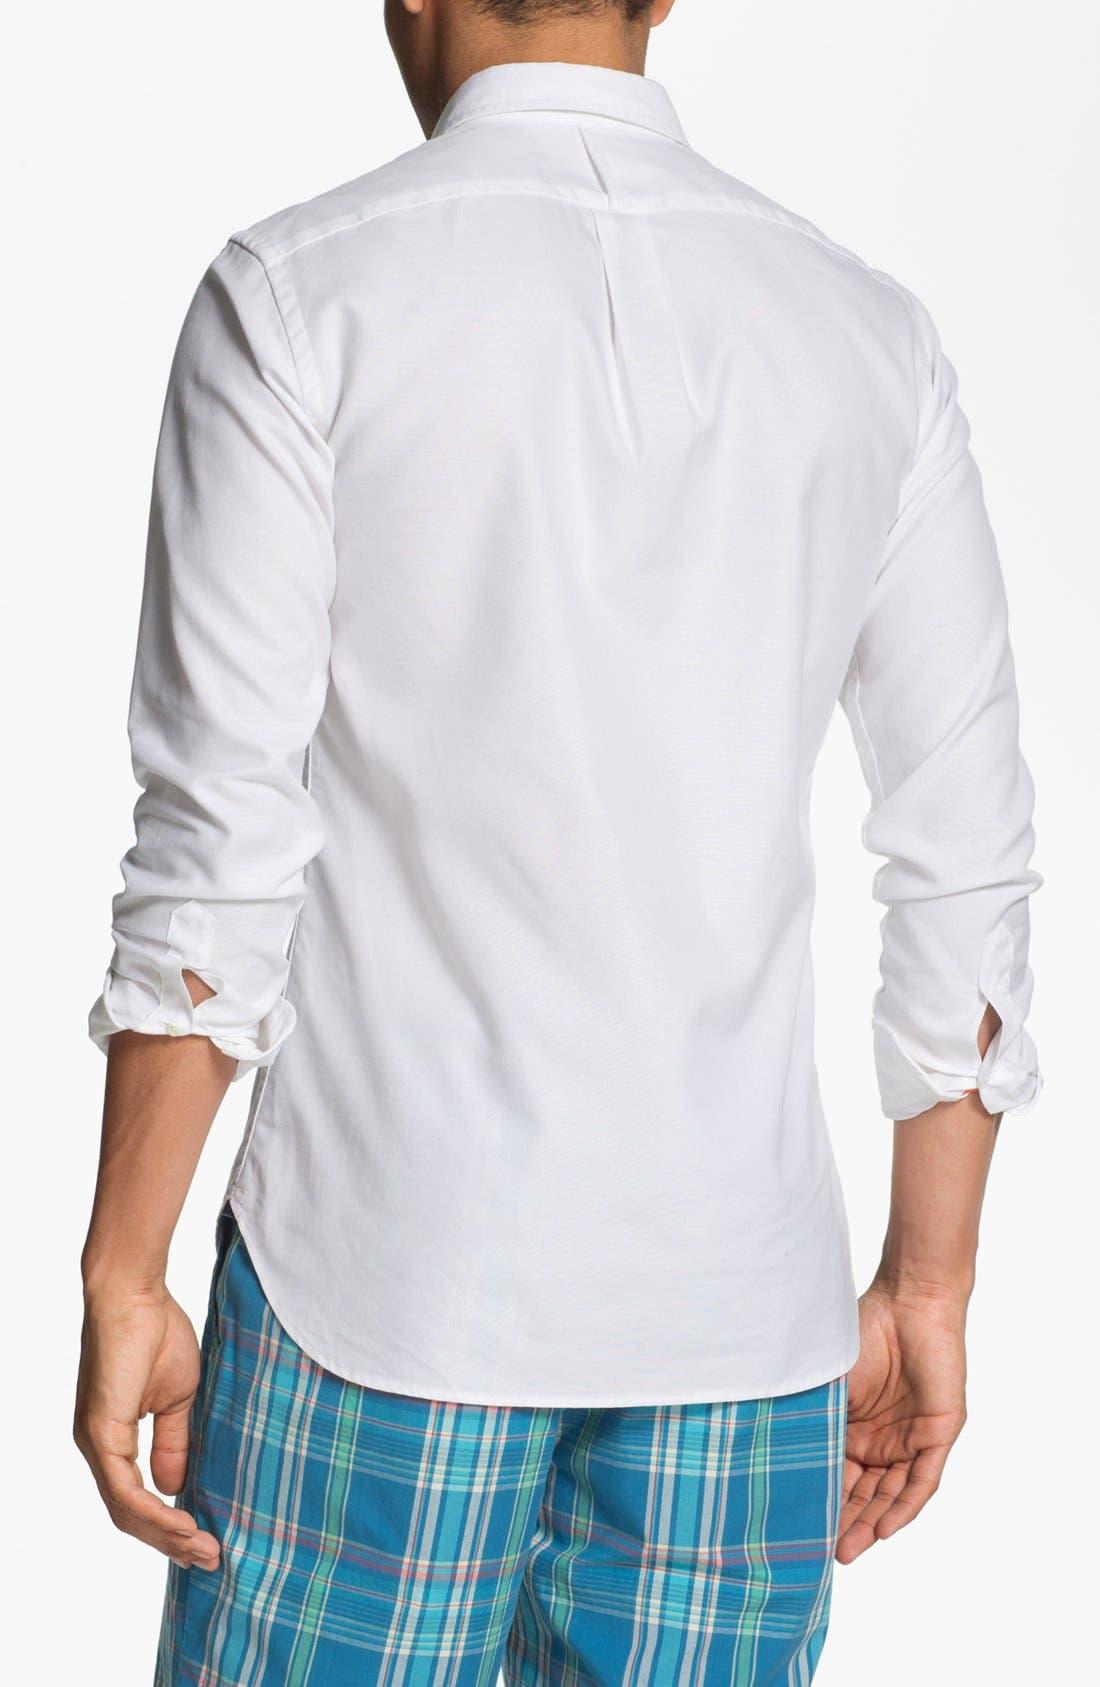 Alternate Image 2  - J. Press York Street Regular Fit Oxford Sport Shirt